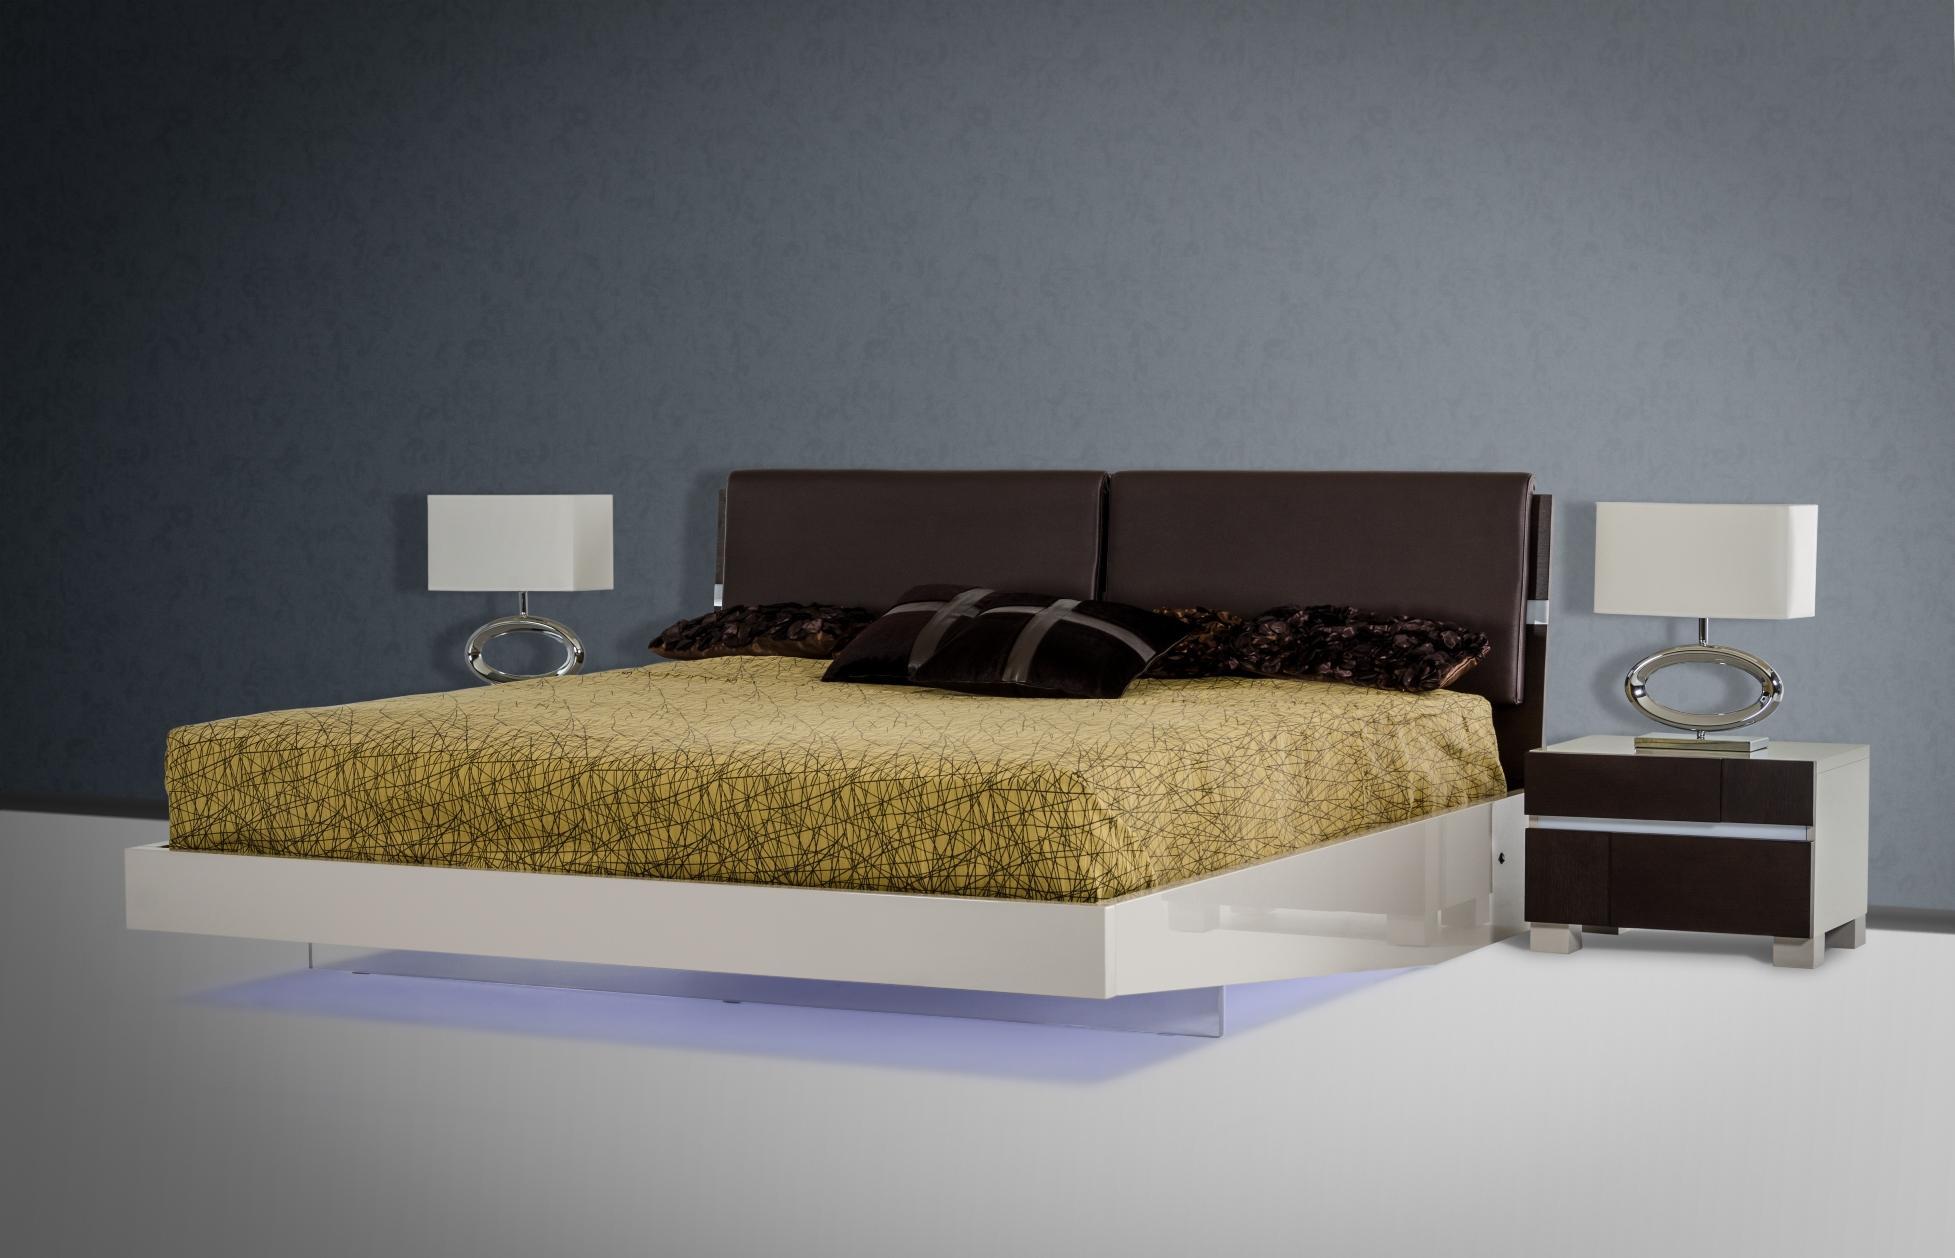 Soflex Birmingham Modern Brown Oak Eco Leather Headboard Floating Eastern King Bed With Led Lights Soflex Birmingham Ek